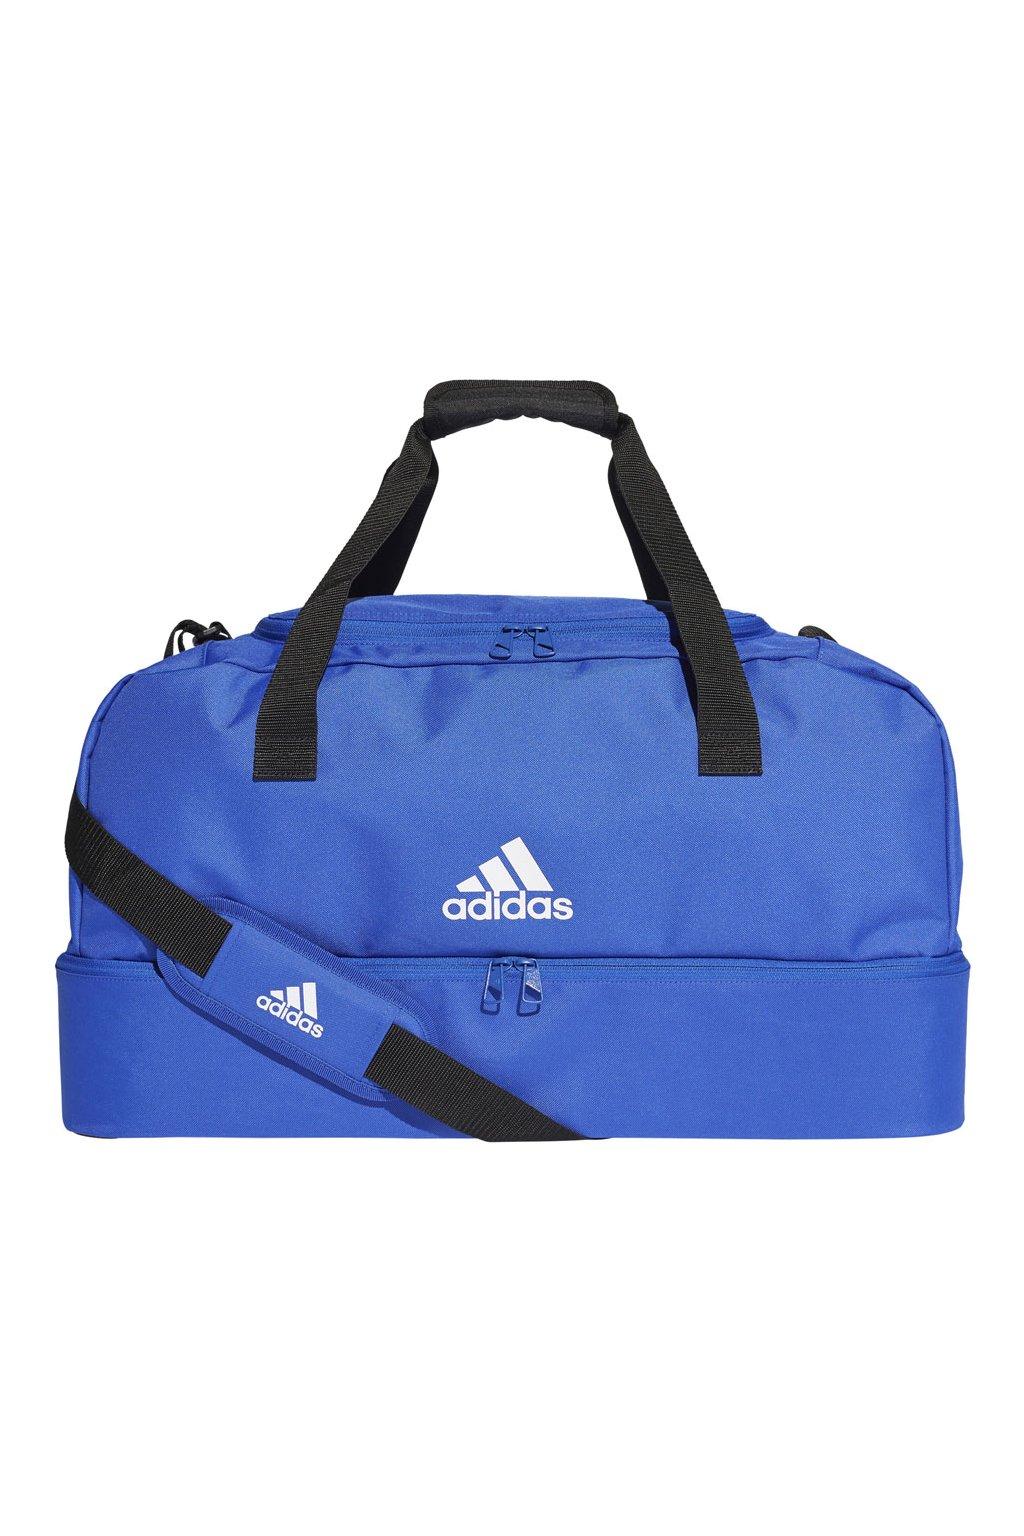 Taška Adidas Tiro Duffel BC M modrá DU2004